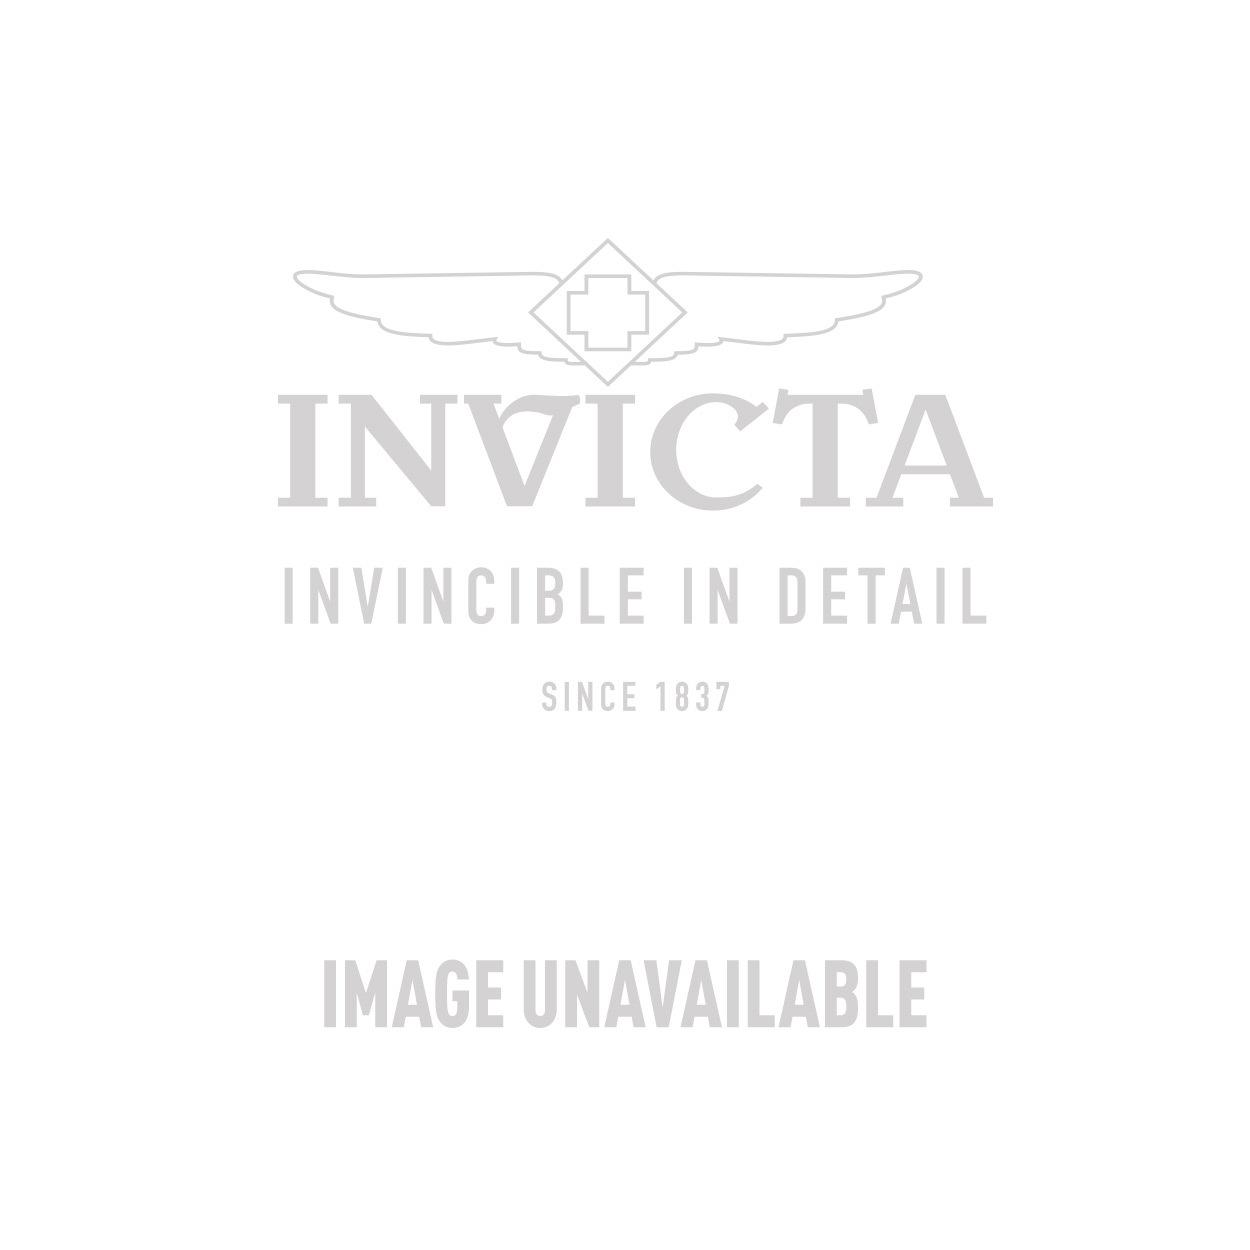 Invicta Corduba Swiss Movement Quartz Watch - Rose Gold case with Green tone Polyurethane band - Model 80310